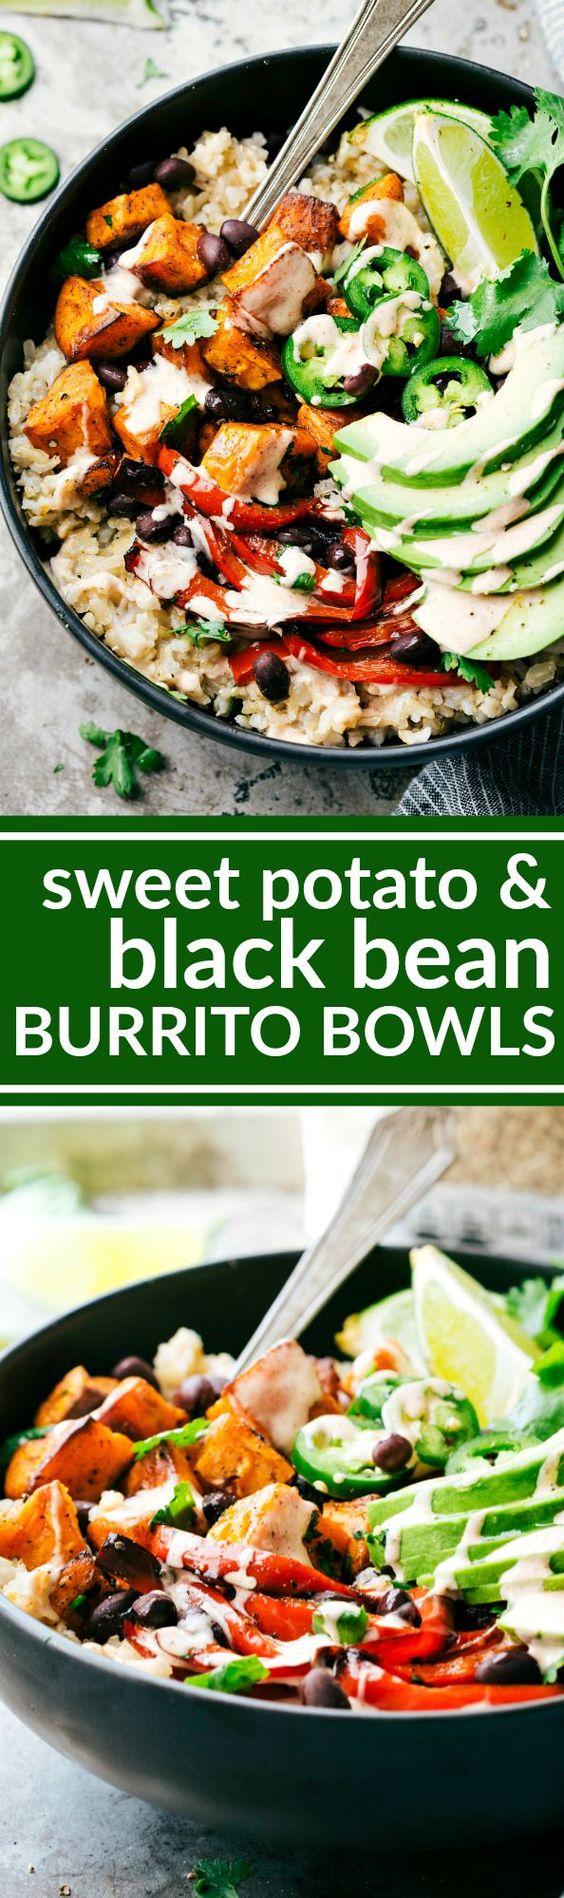 SWEET POTATO BURRITO BOWLS! A delicious and simple to make veggie ...